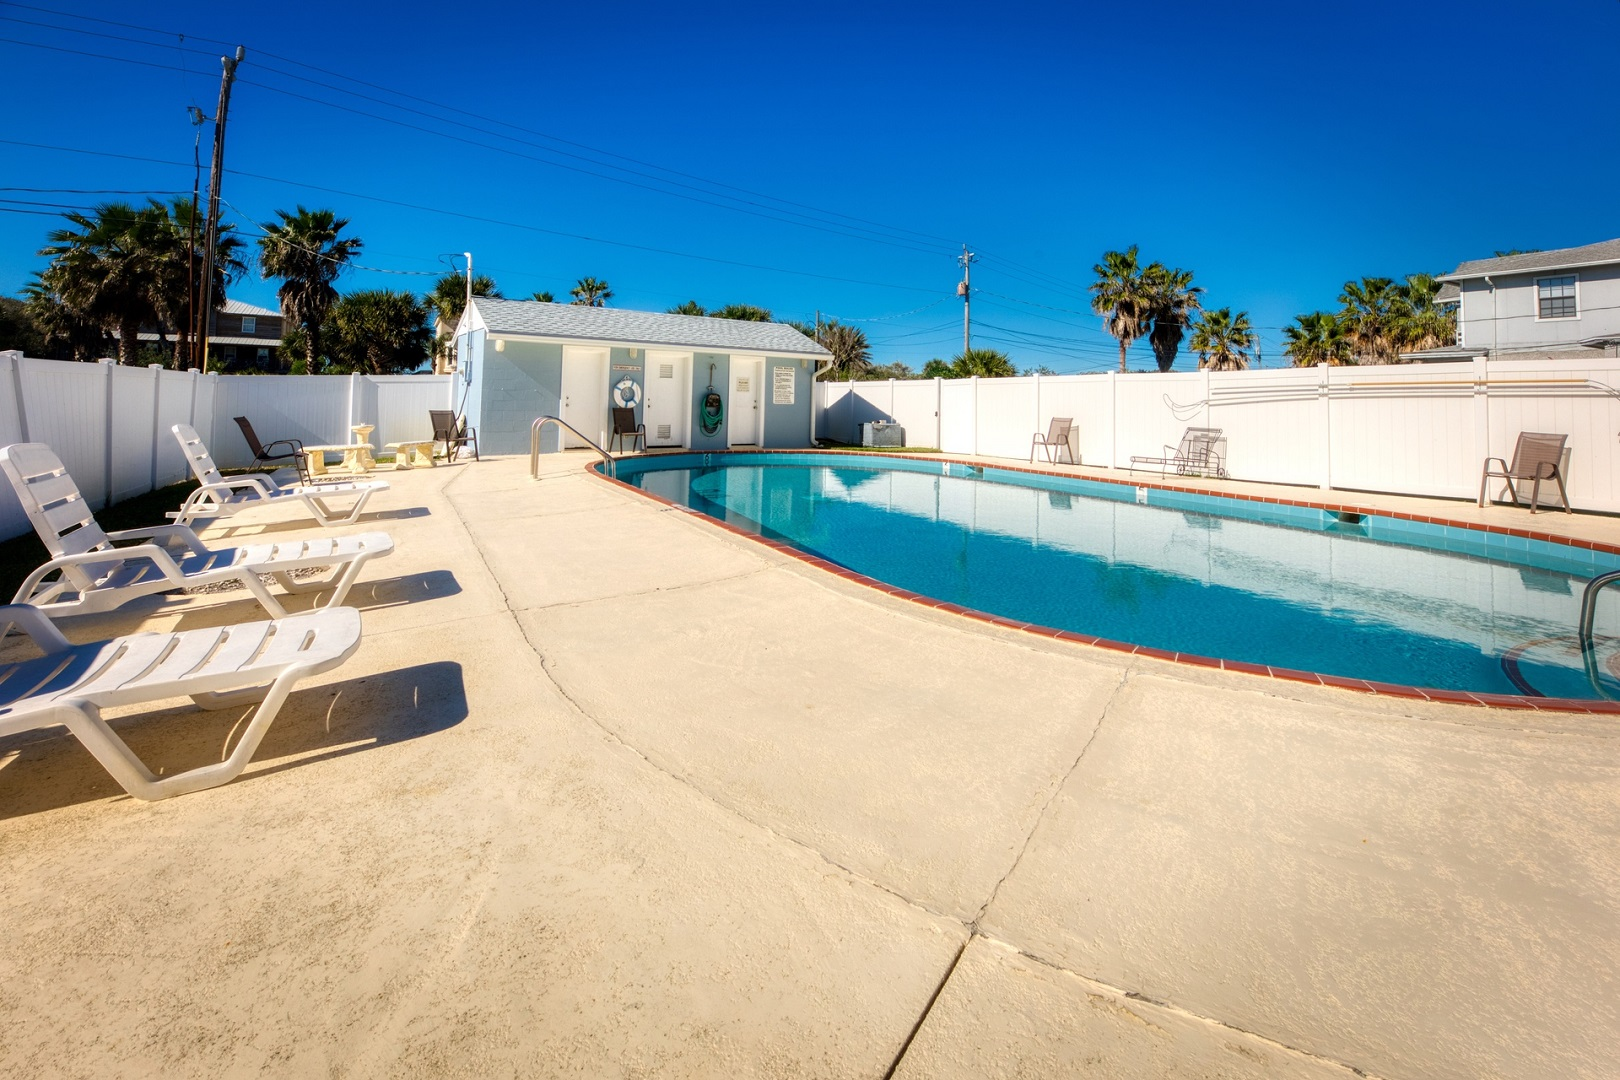 Property Pool